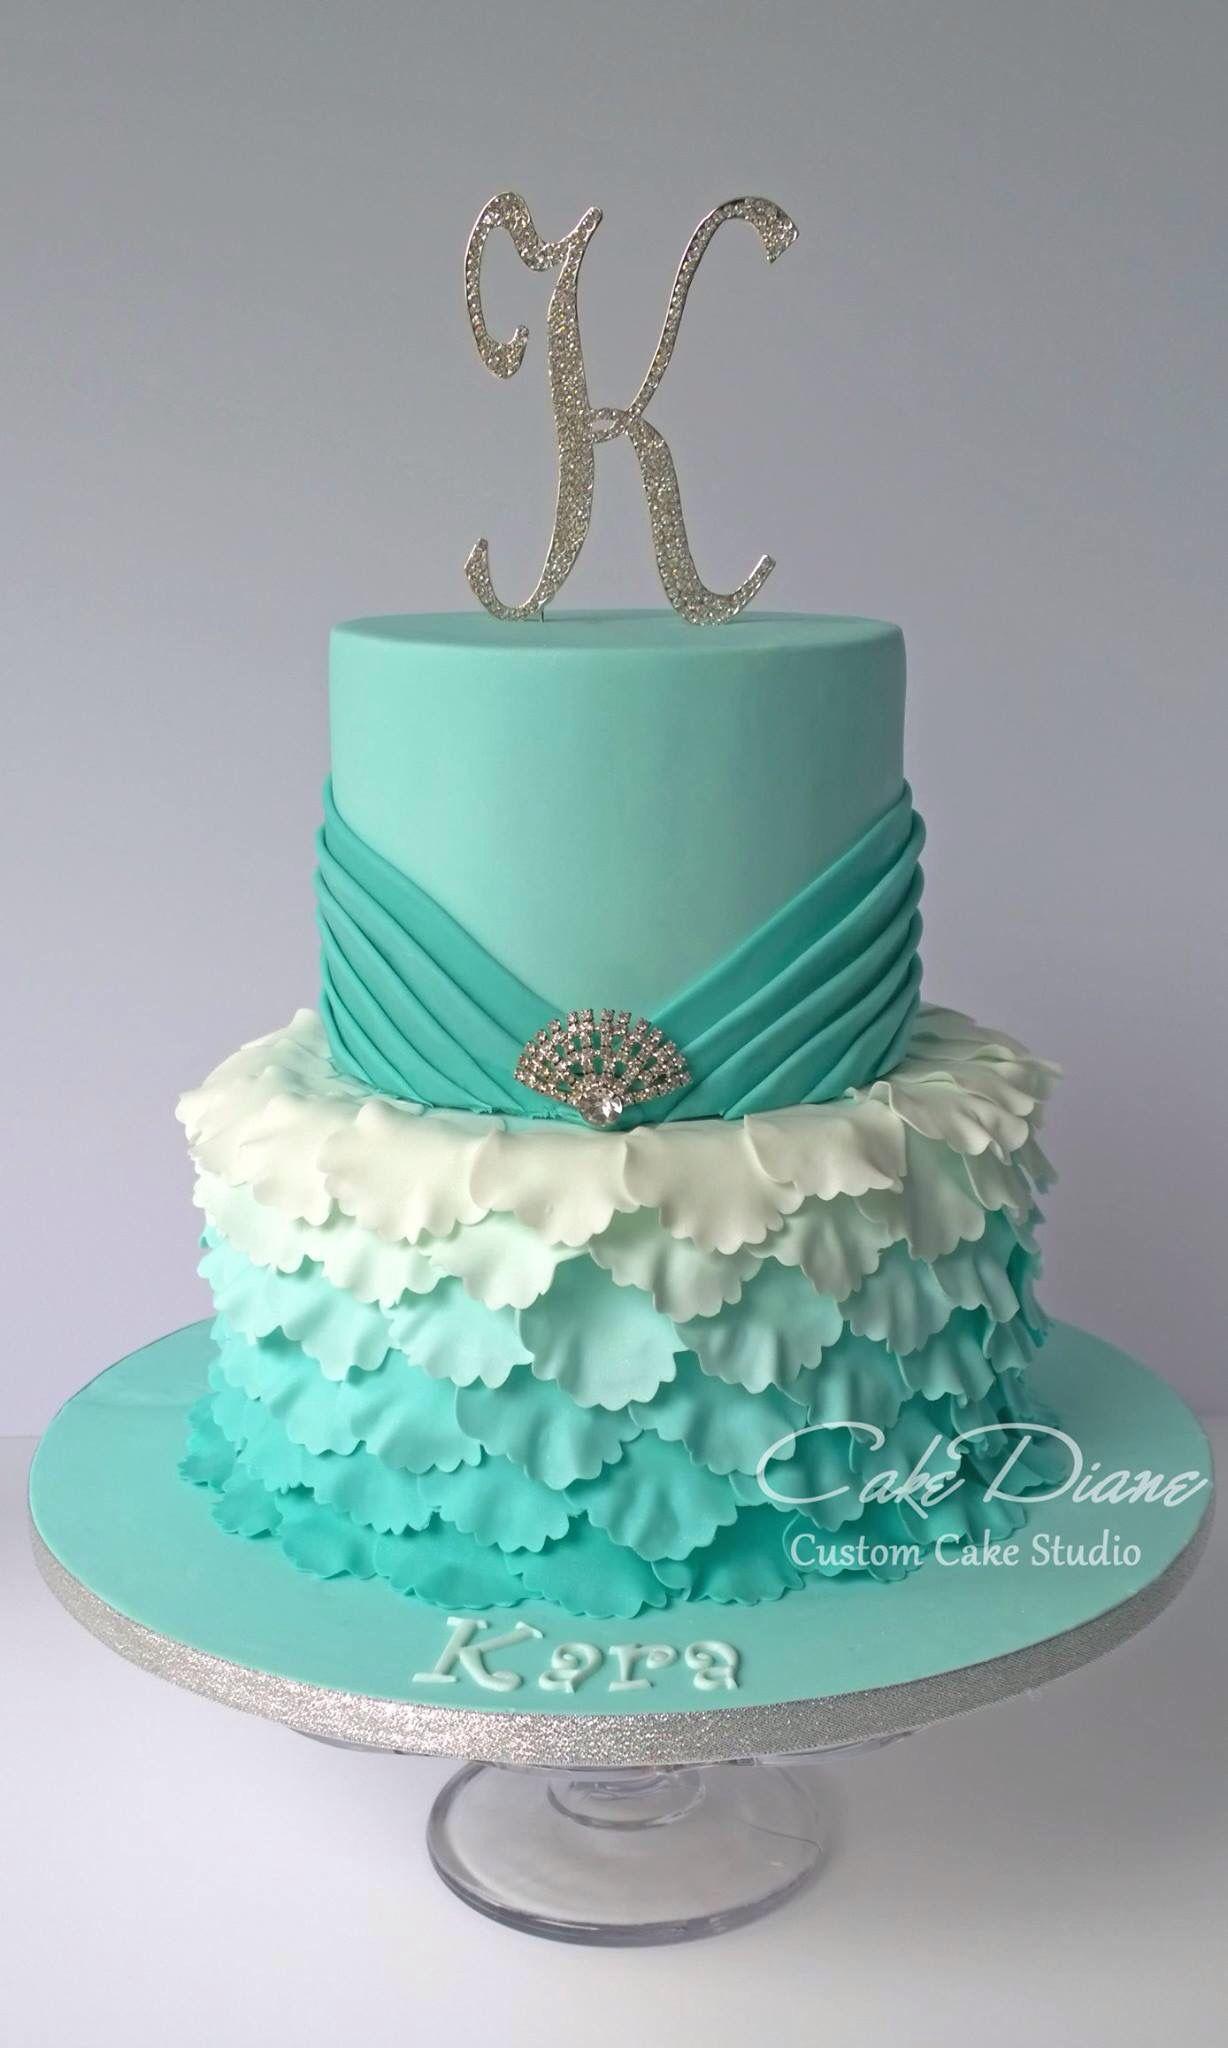 Enjoyable 15 Birthday Cakes Jade Petal Cake Cake Ideas Pinterest Cake Sweet Birthday Cards Printable Riciscafe Filternl